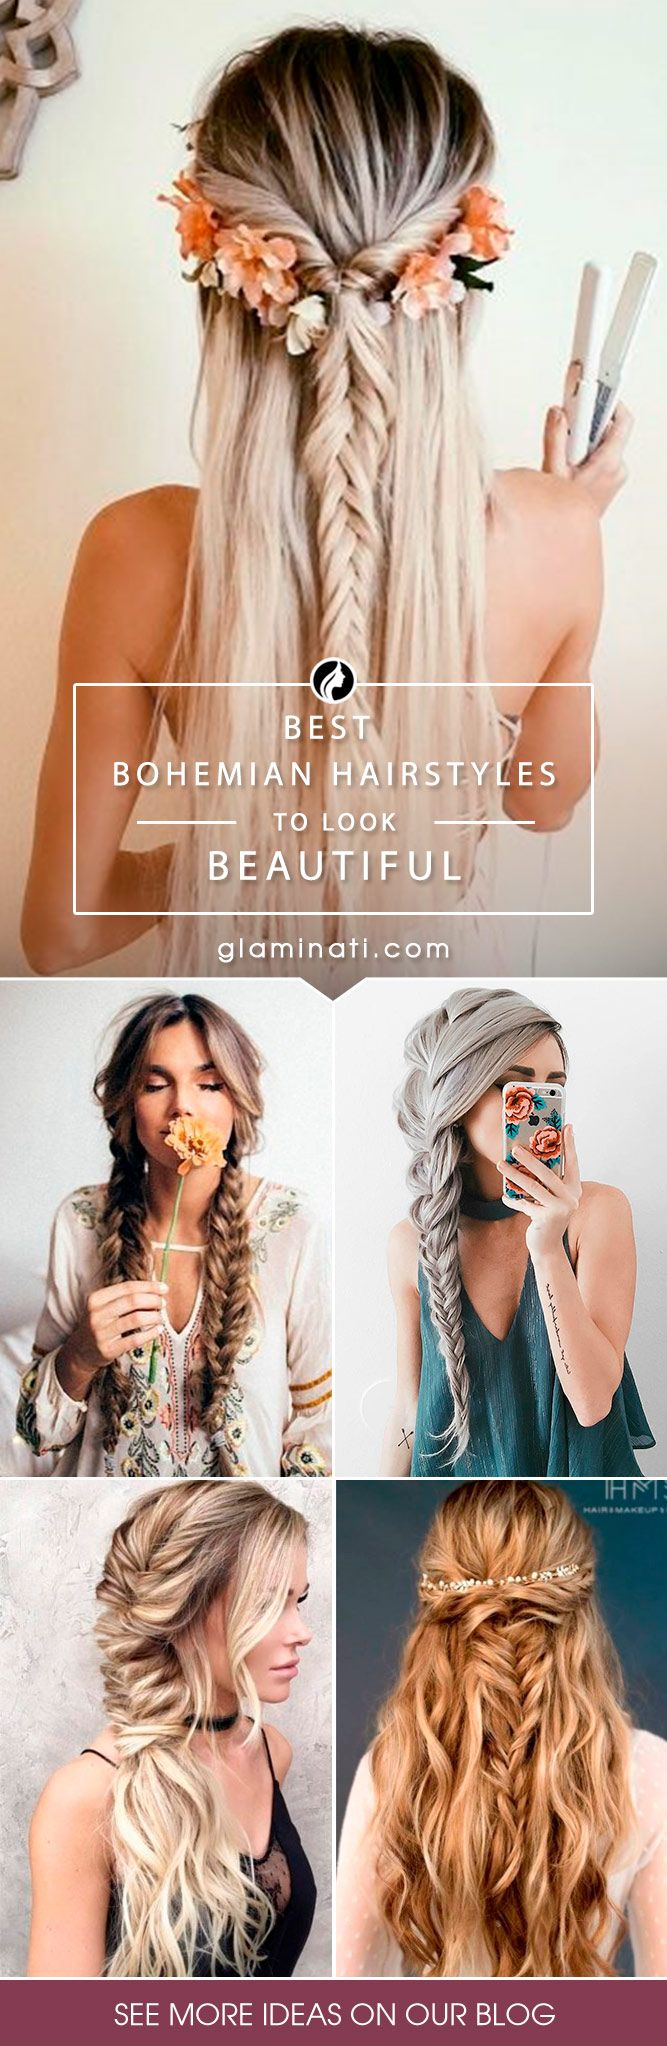 best bohemian hairstyles that turn heads boho hairstyles